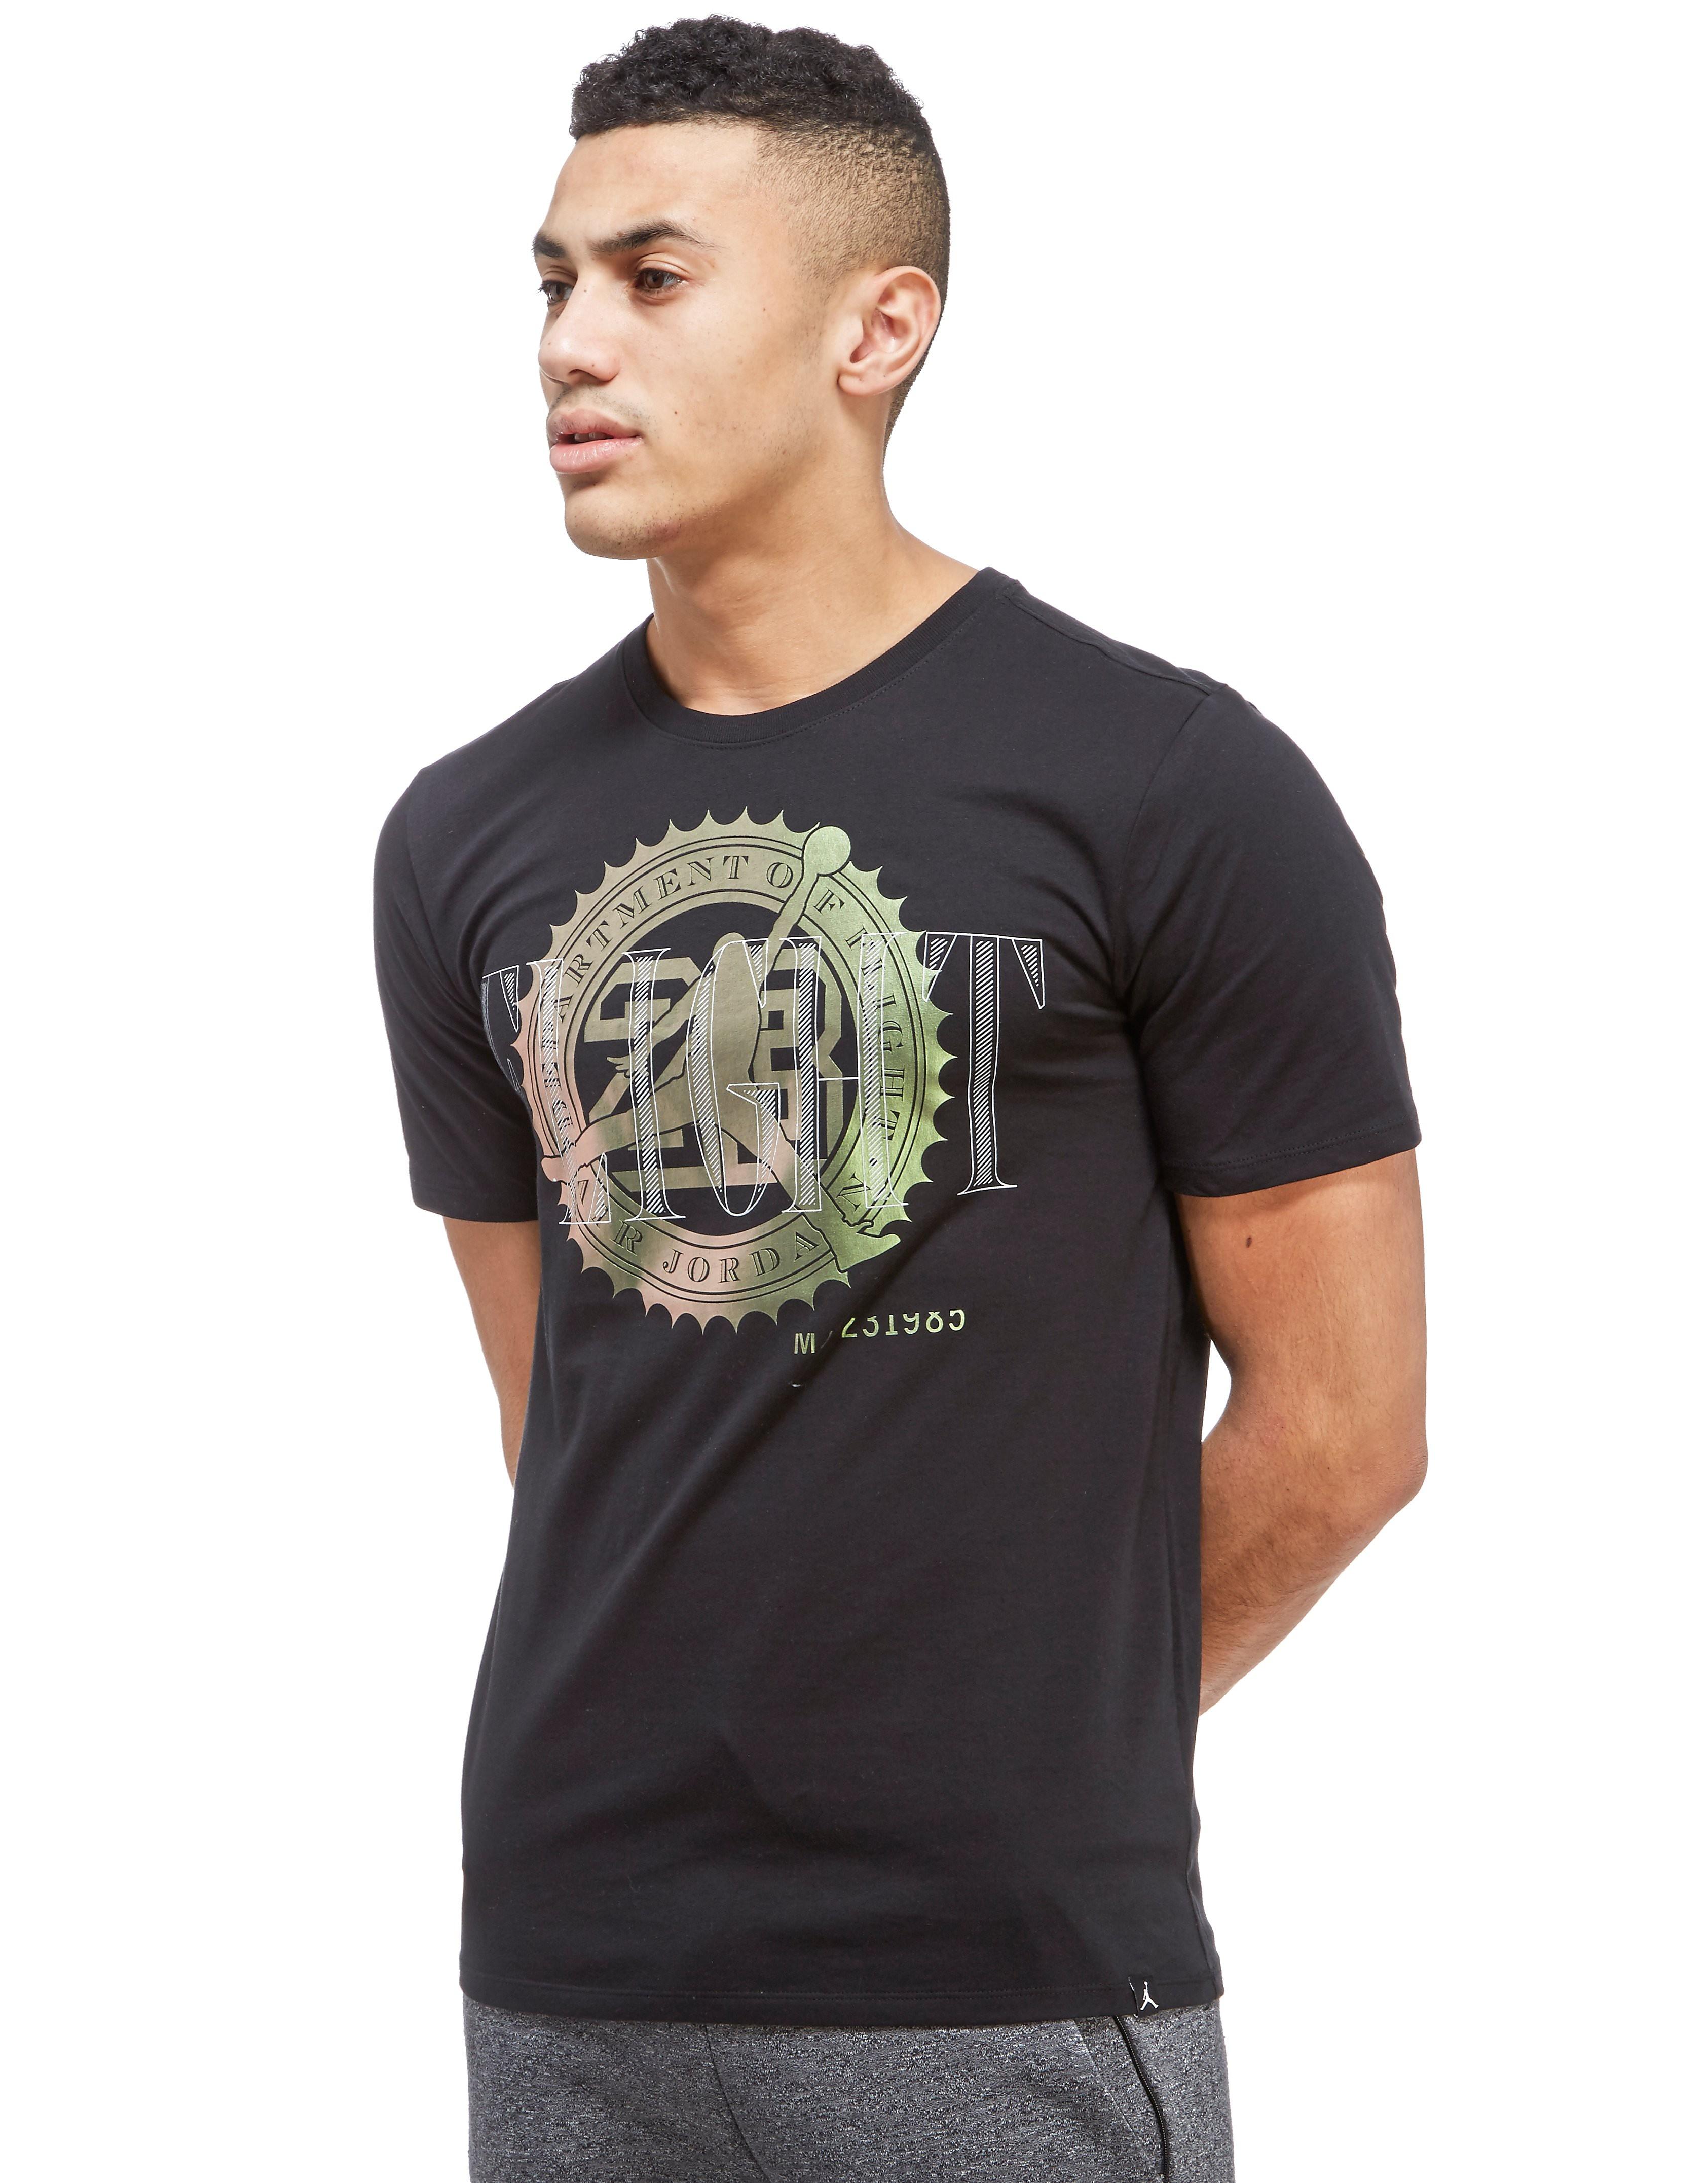 Jordan Money Bank T-Shirt